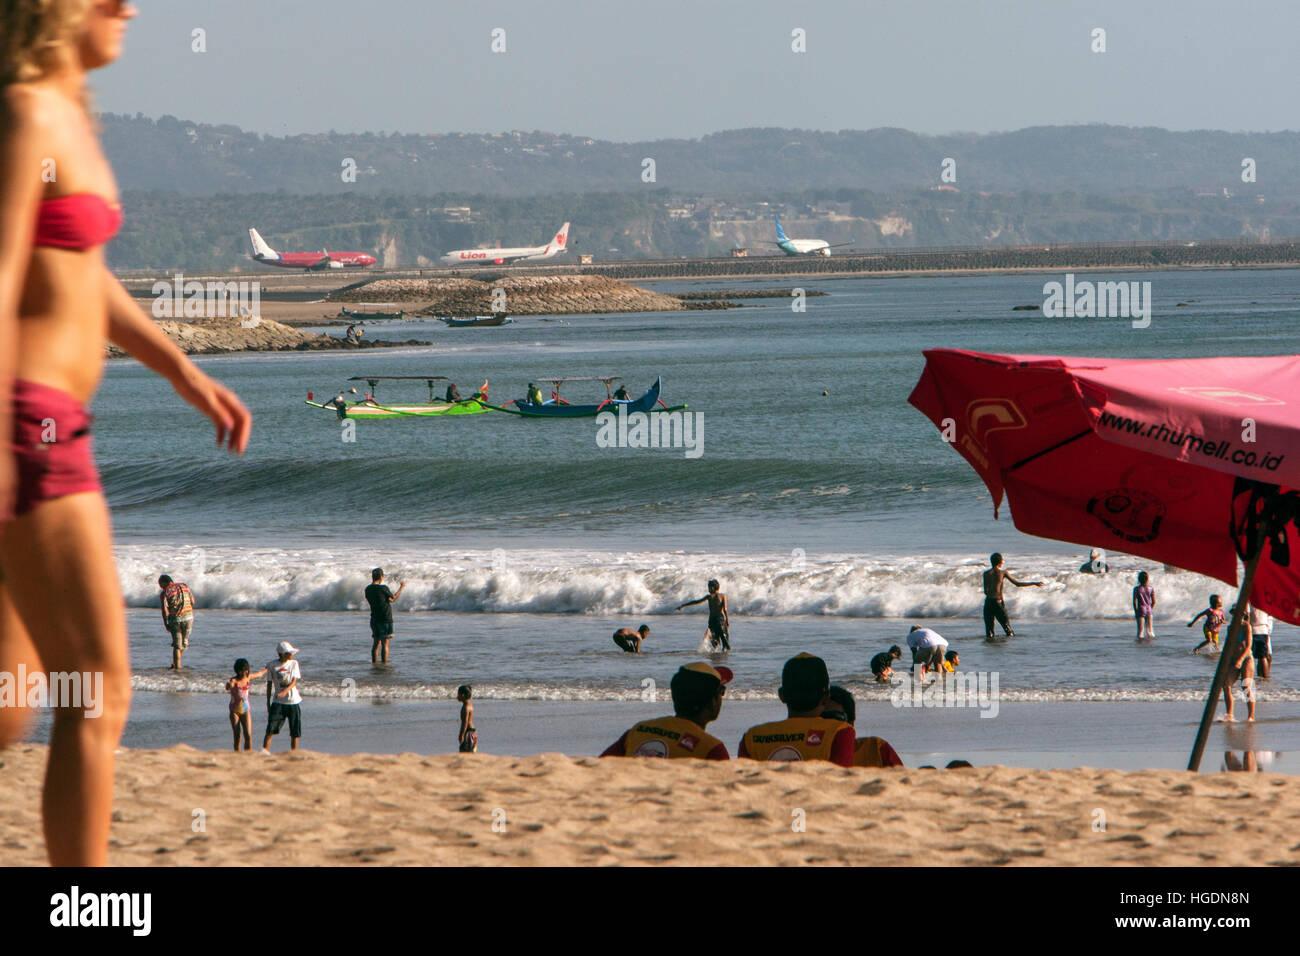 Aeroporto Bali : Spiaggia di kuta e a denpasar aeroporto di ngurah rai bali